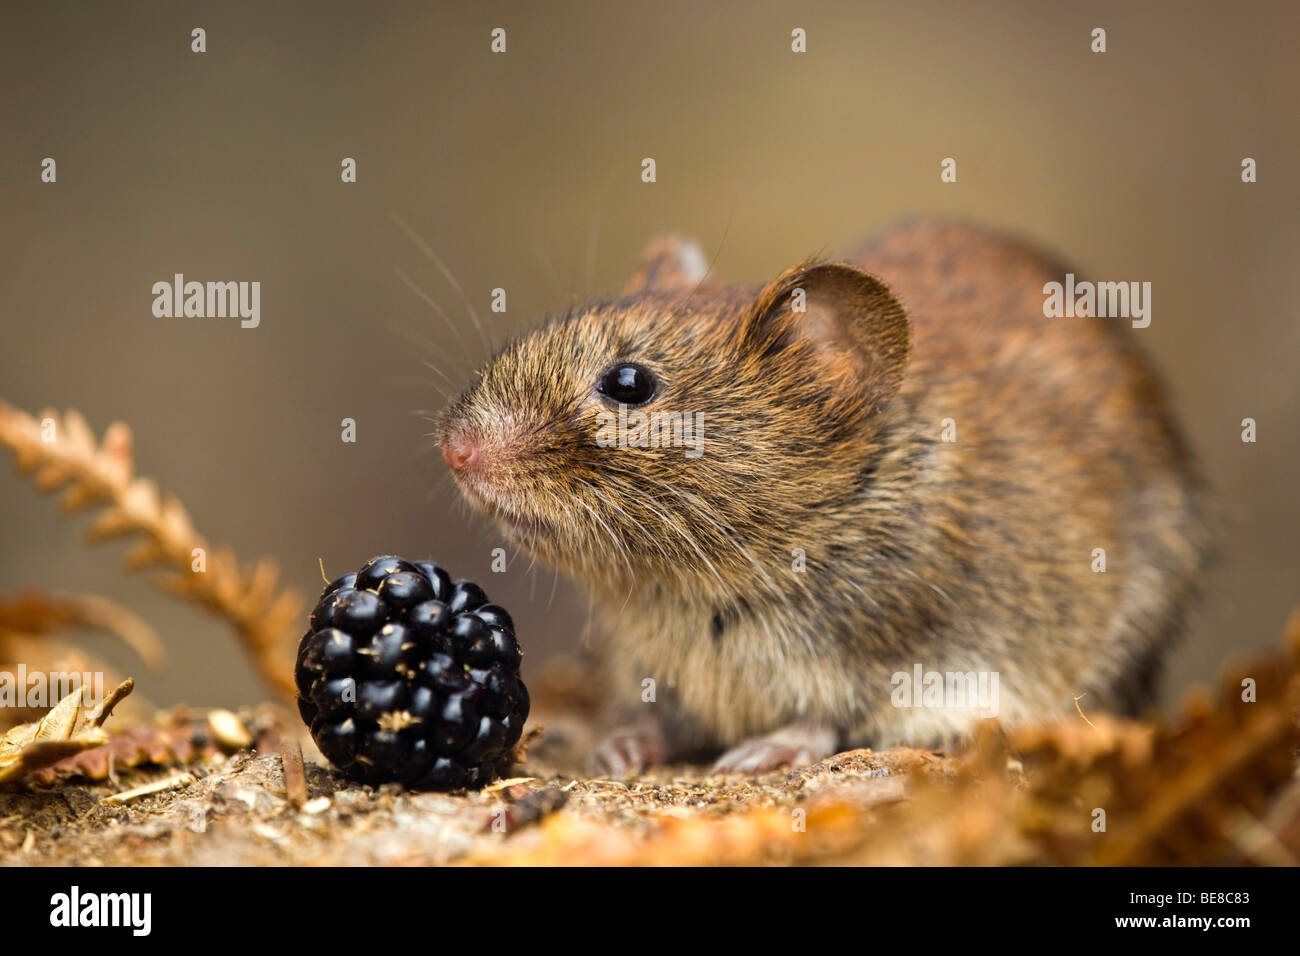 bank vole; Clethrionomys glareolus; with blackberry - Stock Image